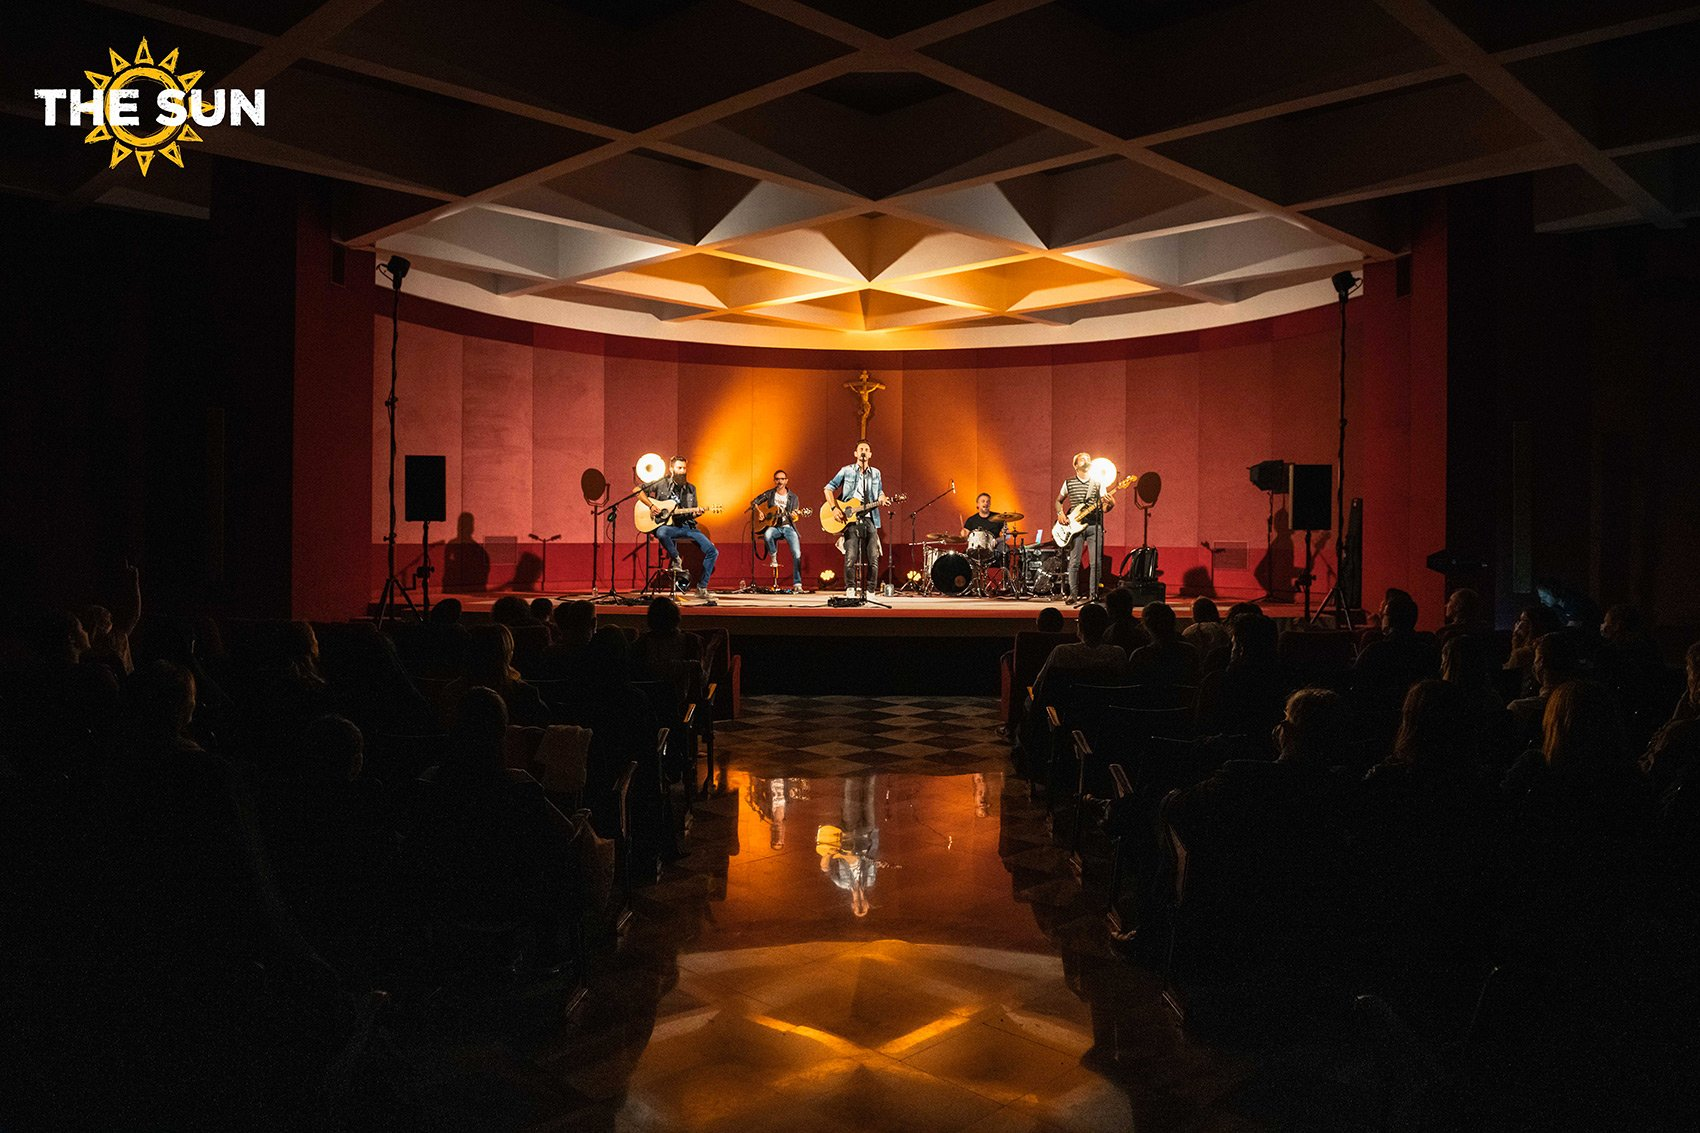 the sun rock band live genova